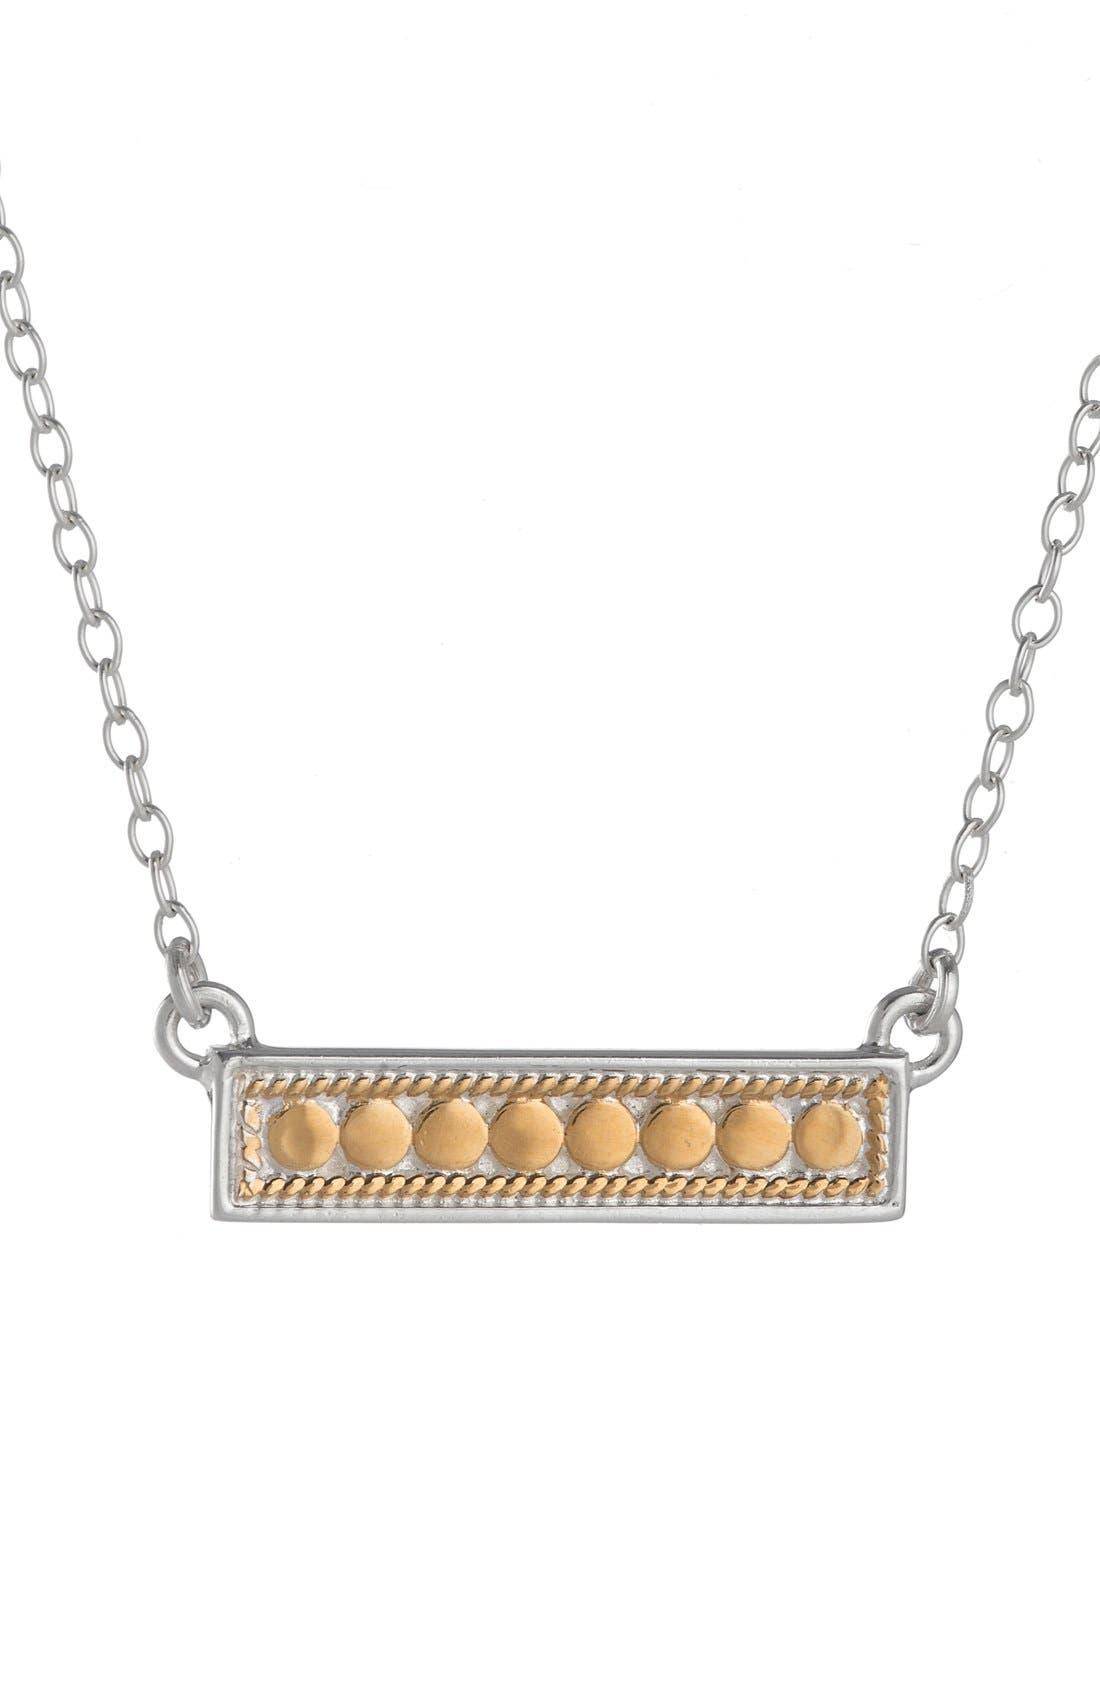 Main Image - Anna Beck 'Gili' Bar Pendant Necklace